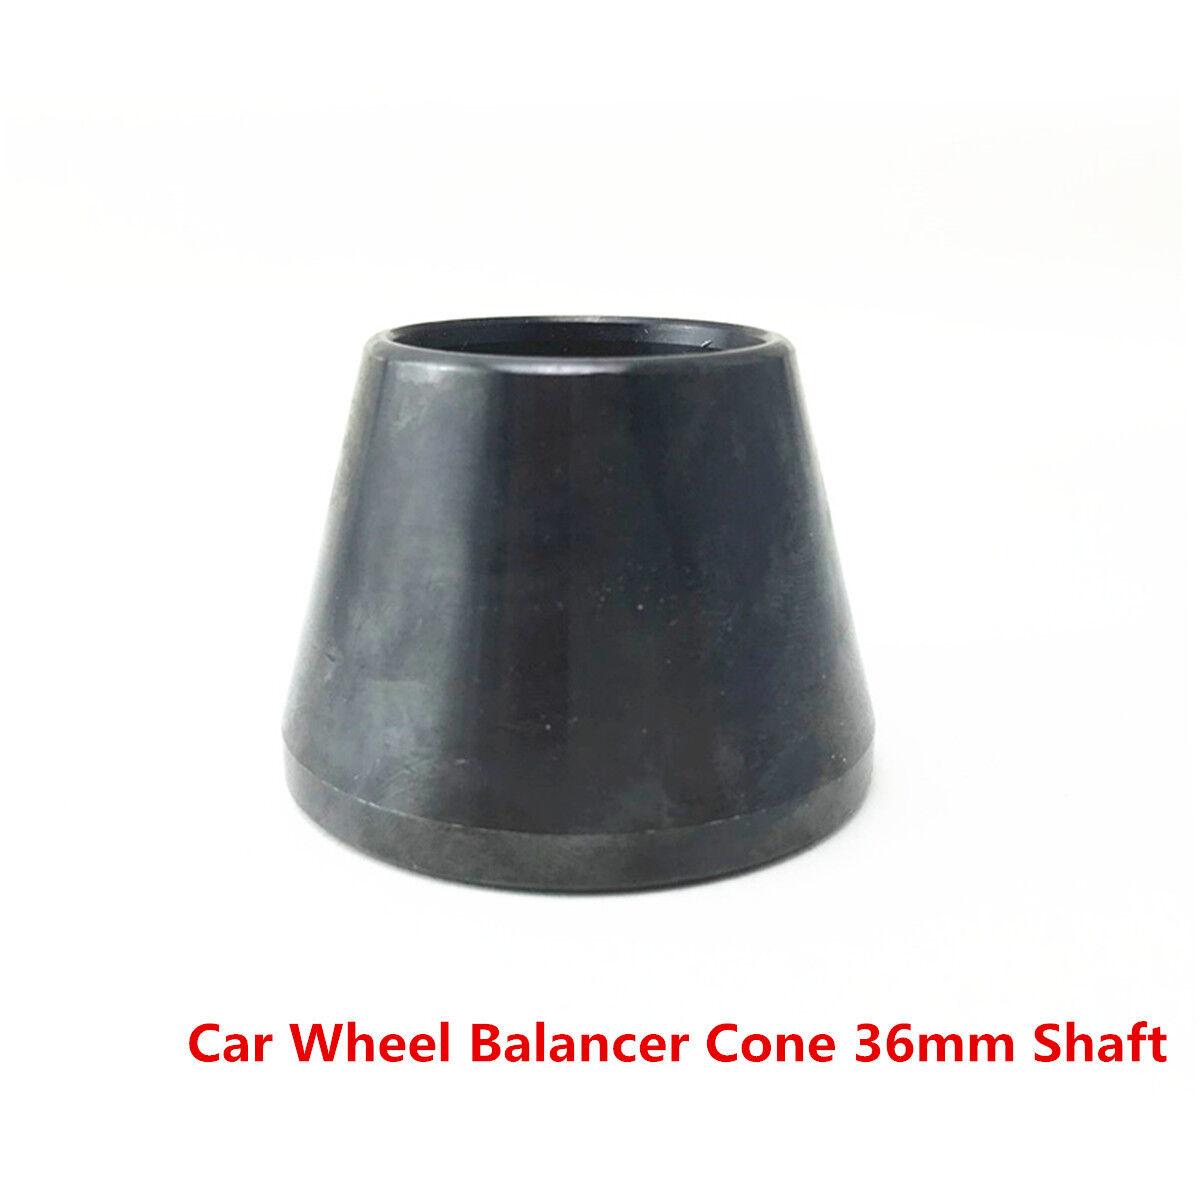 "1PC 36mm 3.5"" to 5.5"" Universal #45 Carbon Steel Car Wheel Balancer Cone Shaft"